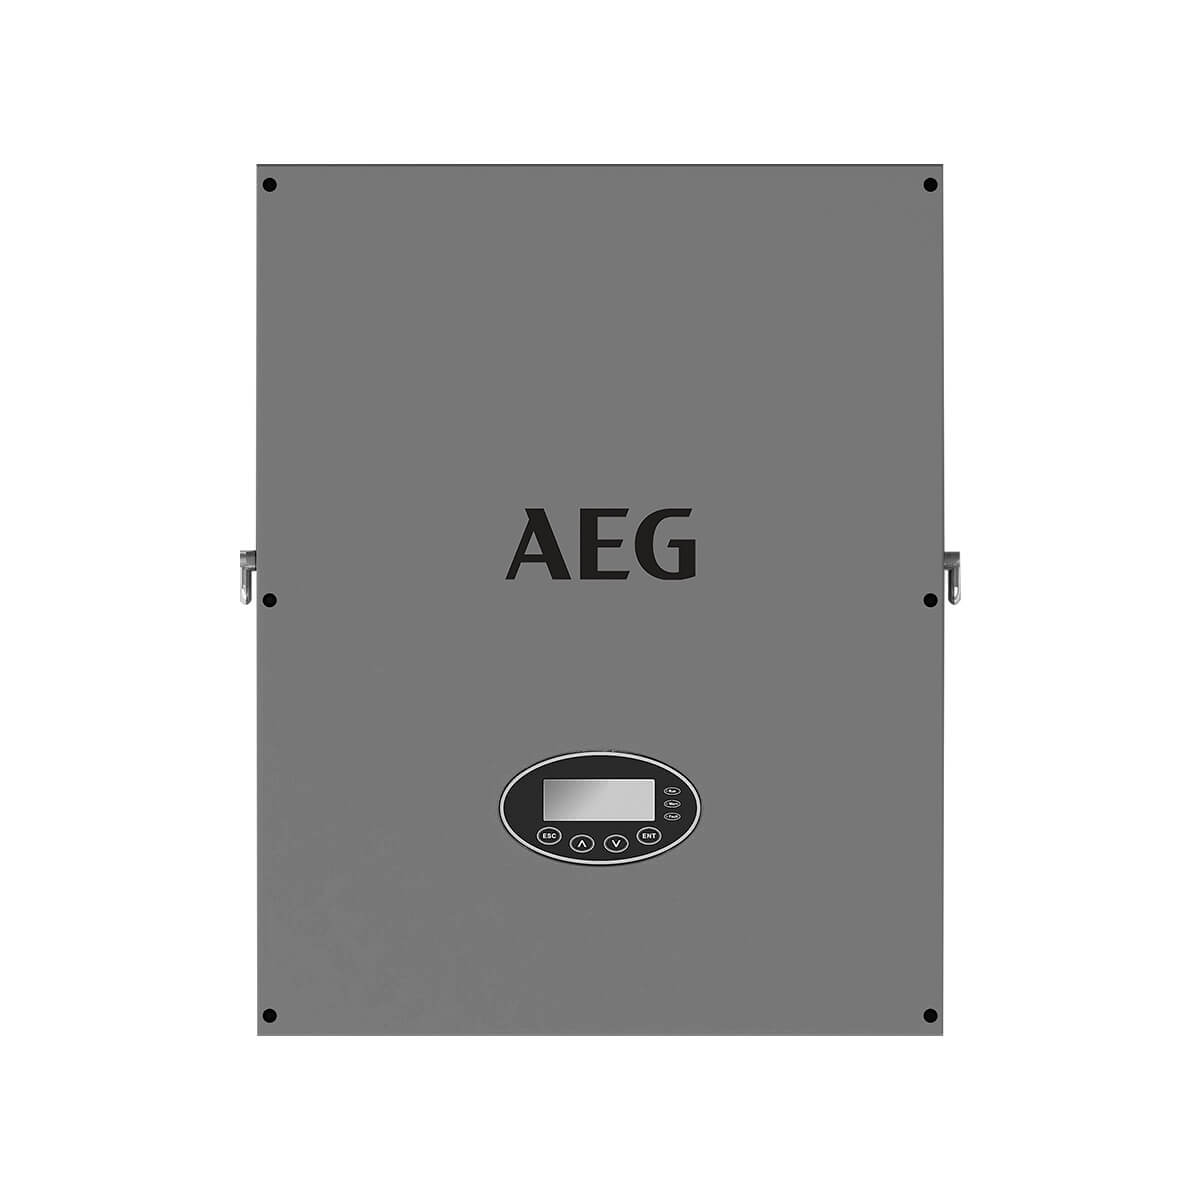 aeg 30kW inverter, aeg as-ic01 30kW inverter, aeg as-ic01-30000-2 inverter, aeg as-ic01-30000-2, aeg as-ic01 30kW